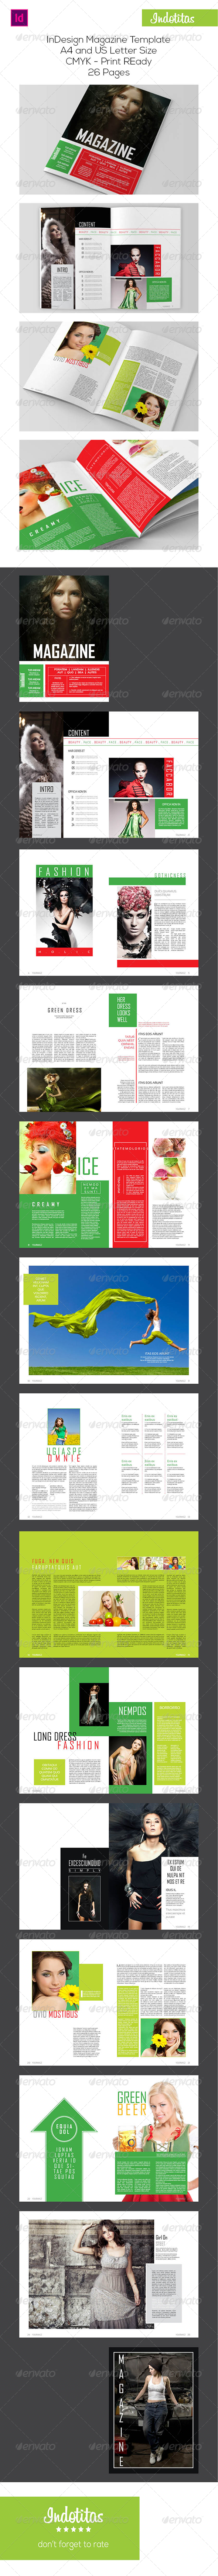 InDesign Magazine Template | Indesign magazine templates, Template ...